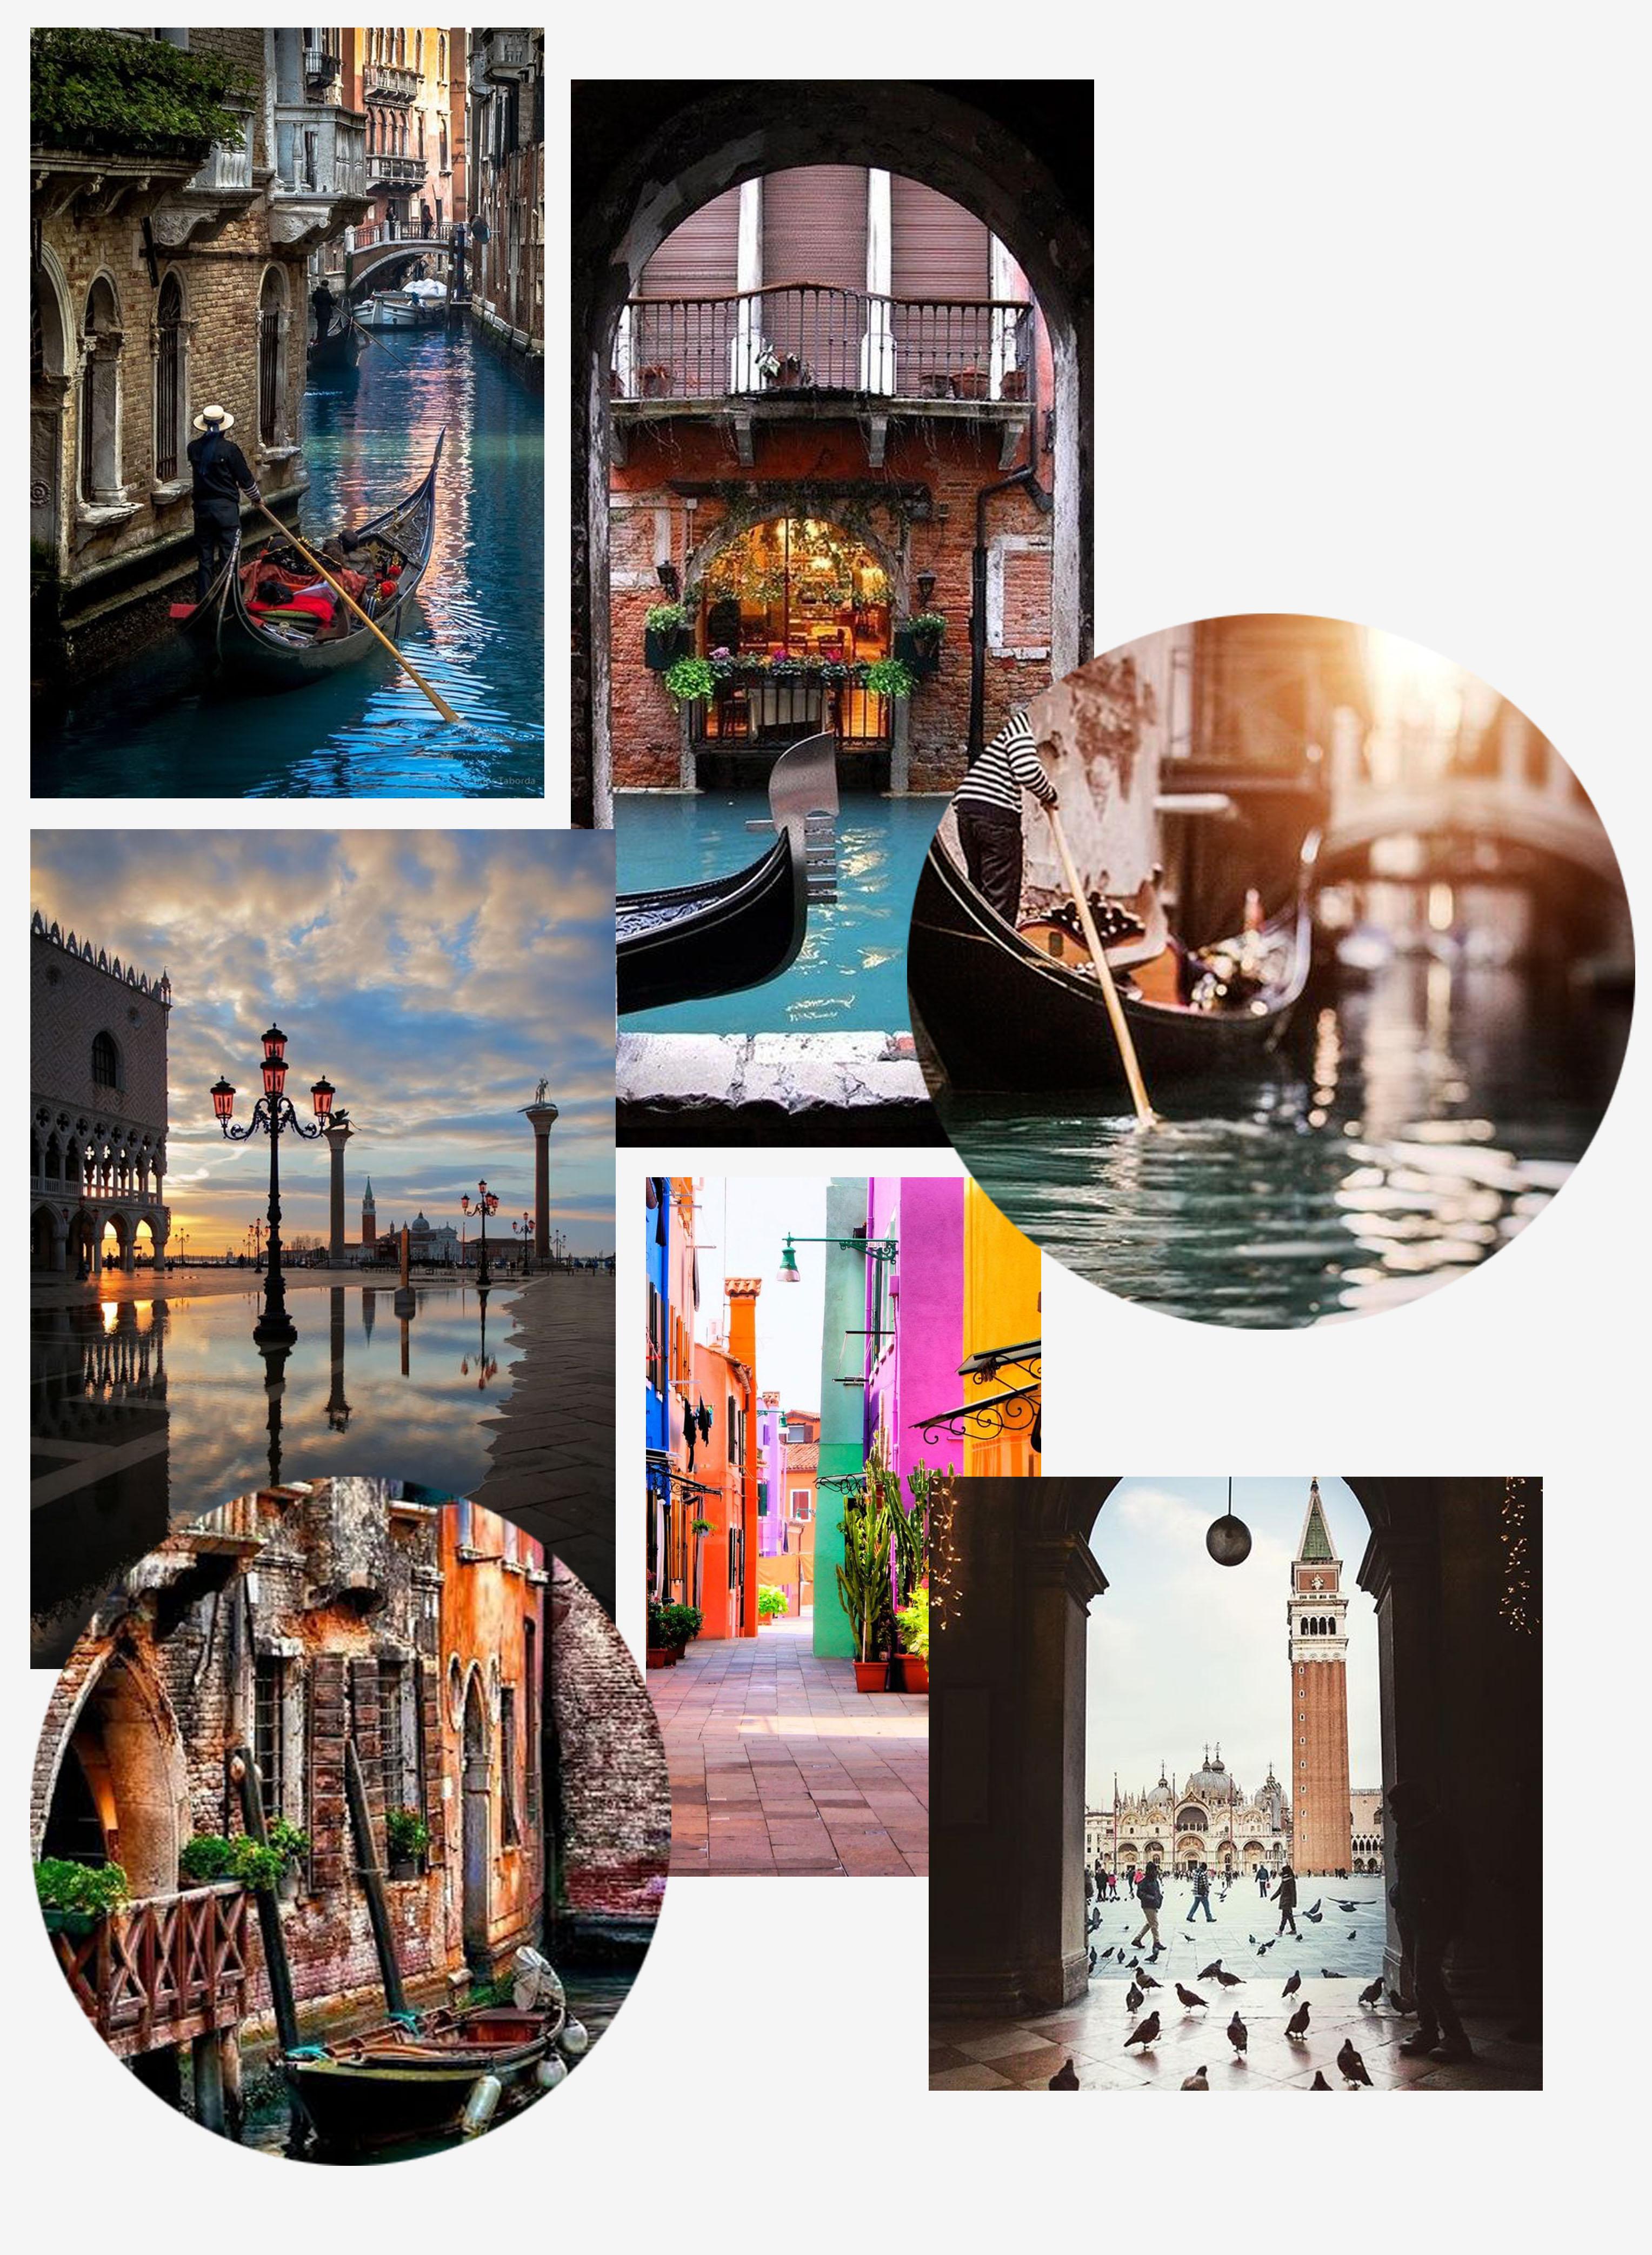 Next Stop: Venice